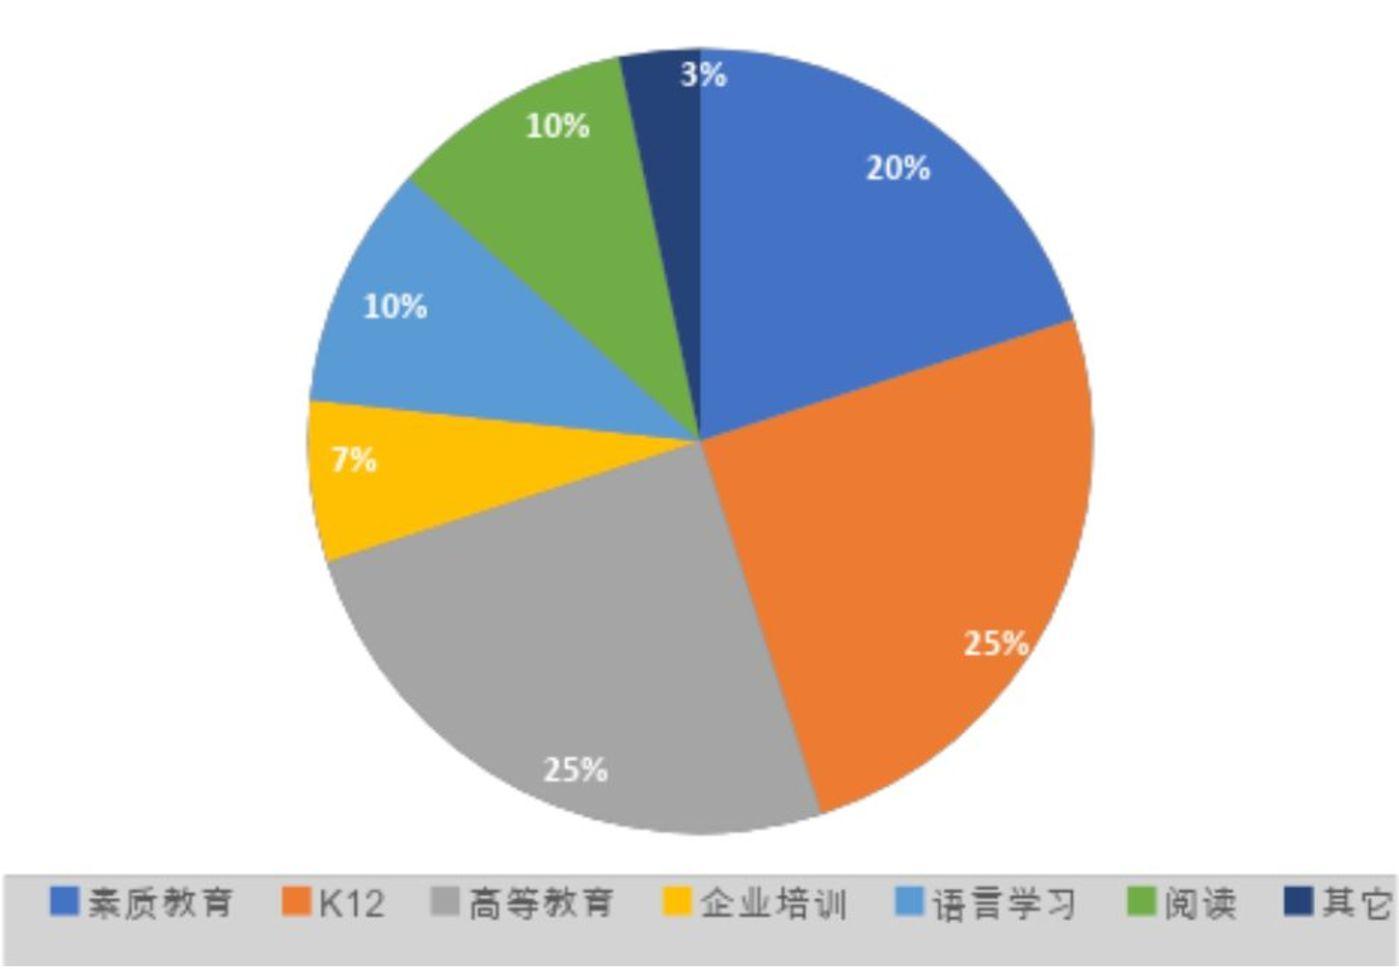 Top 30 AI+教育公司服务领域分布